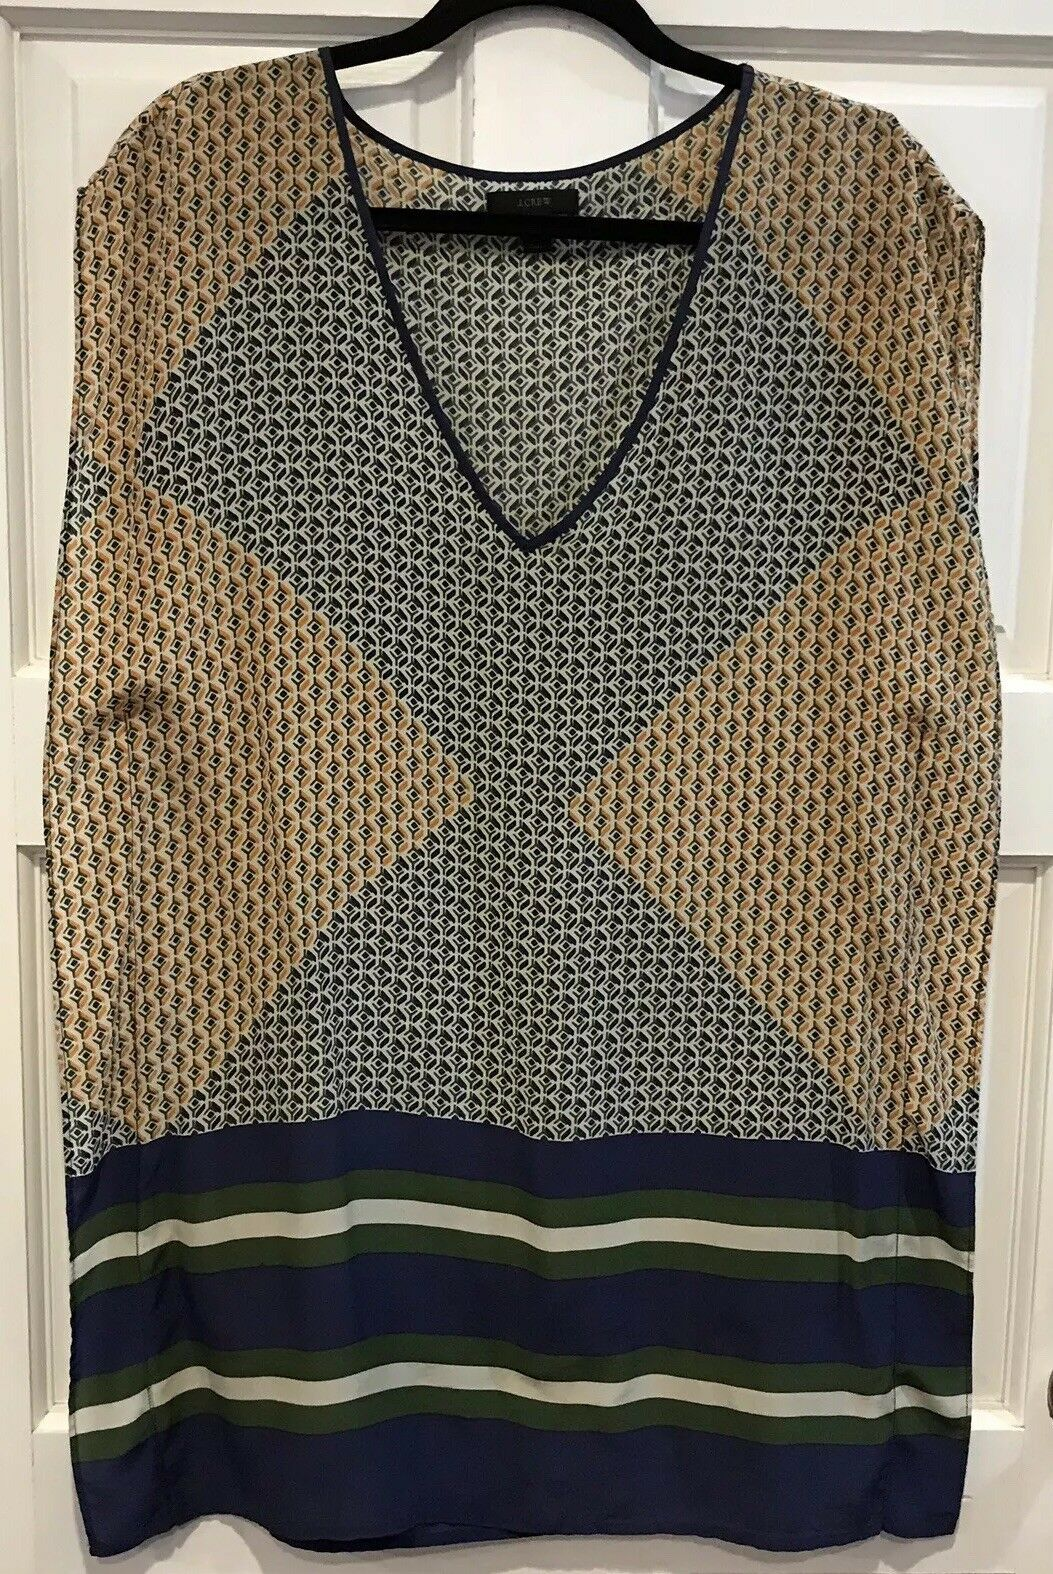 J. Crew Silk Abstract Diamond Tunic Beach Cover-Up Dress Womens XS bluee Green